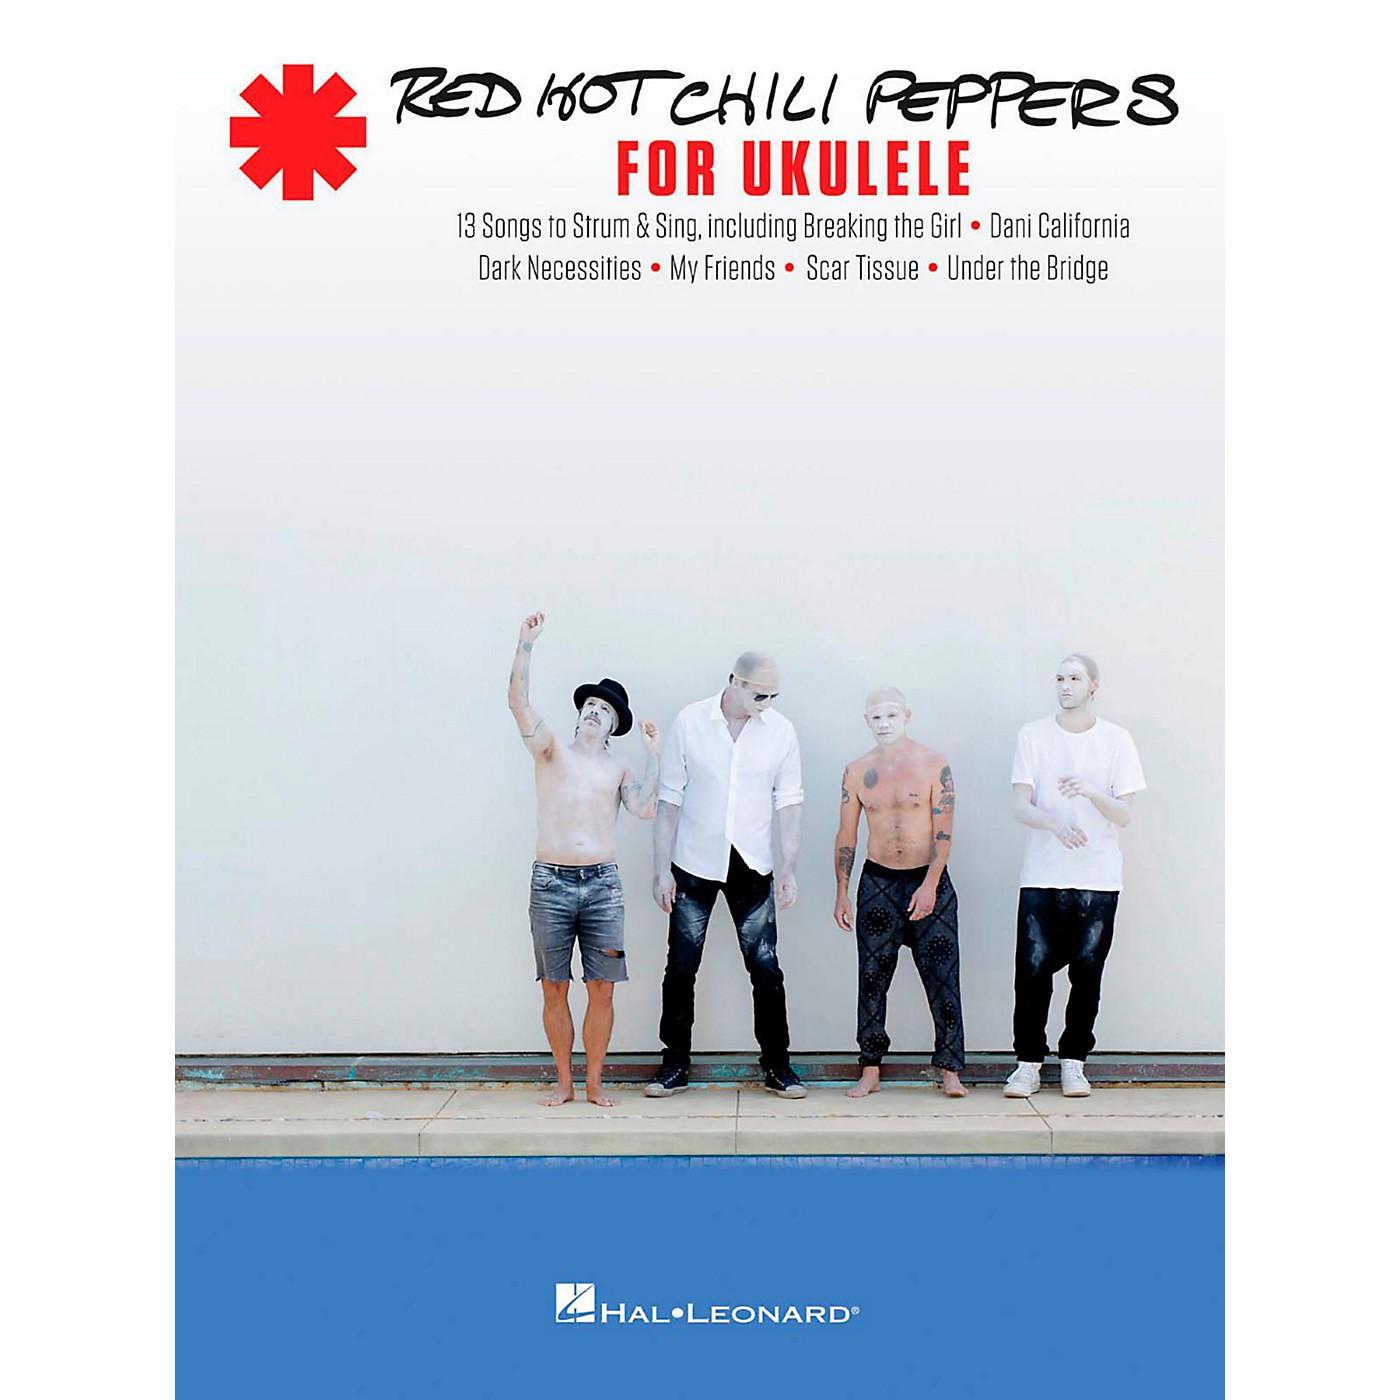 Hal Leonard Red Hot Chili Peppers for Ukulele thumbnail